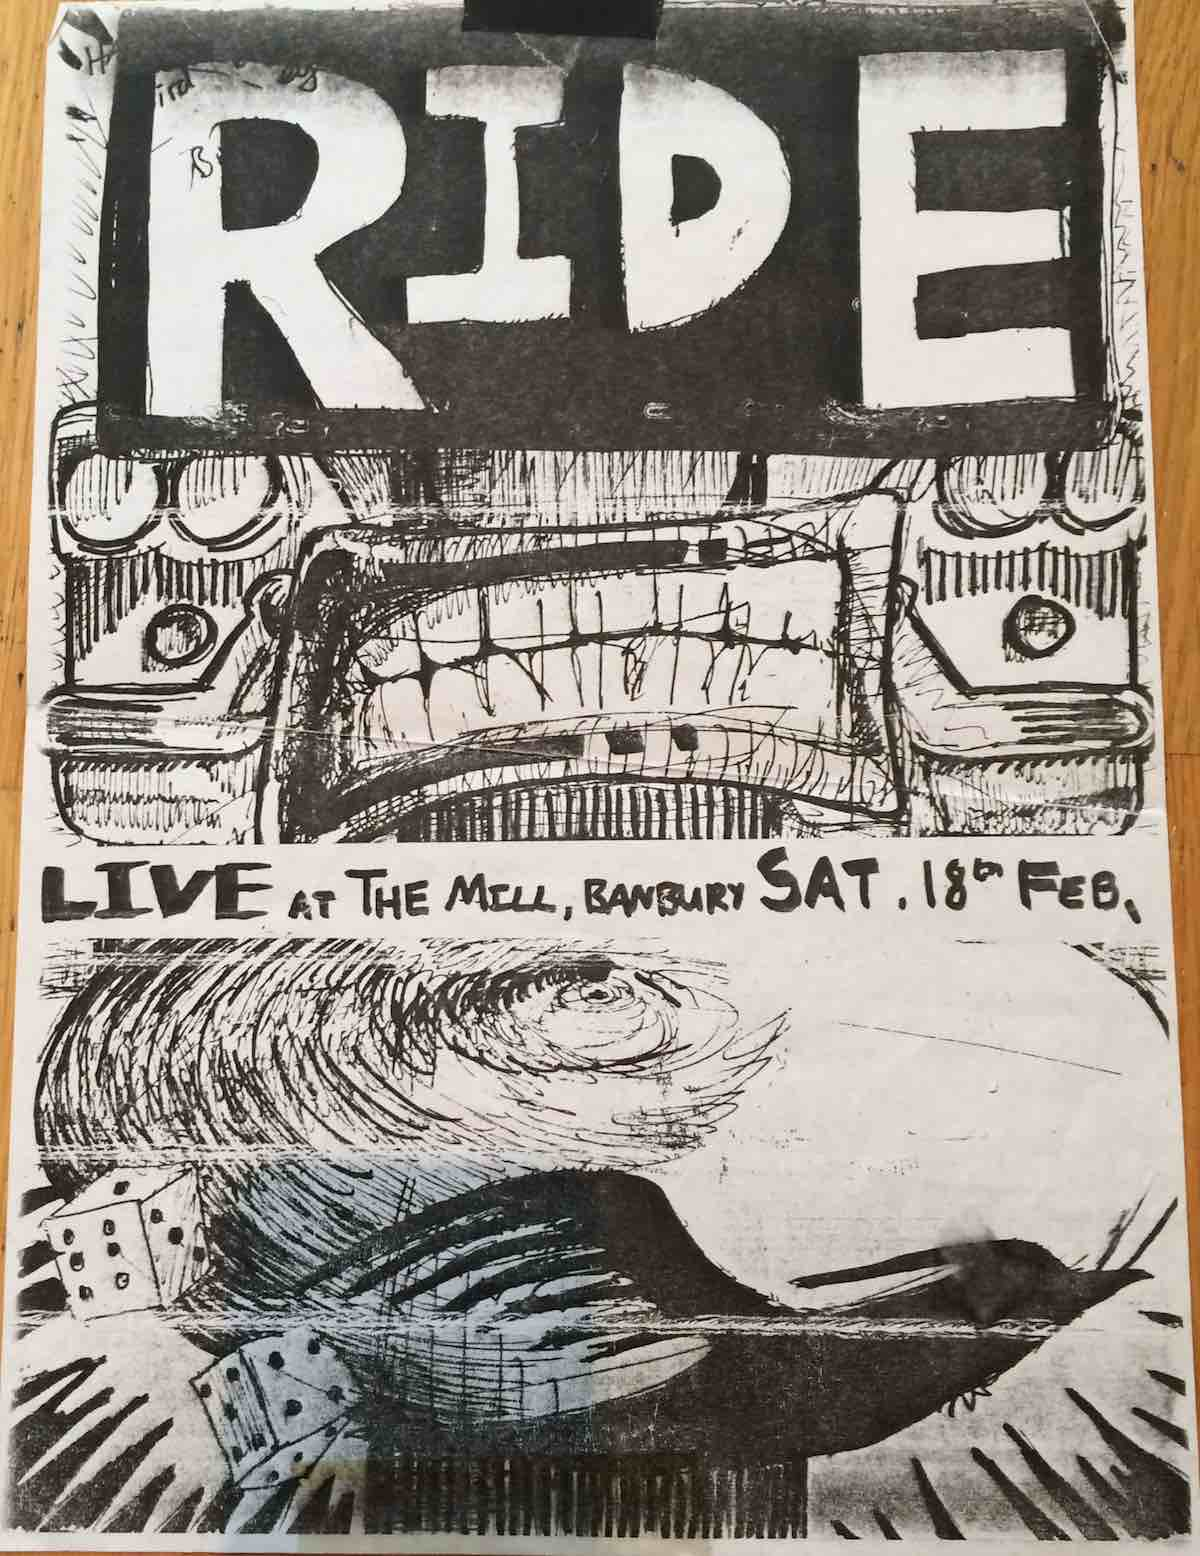 Banbury Mill poster February 1989